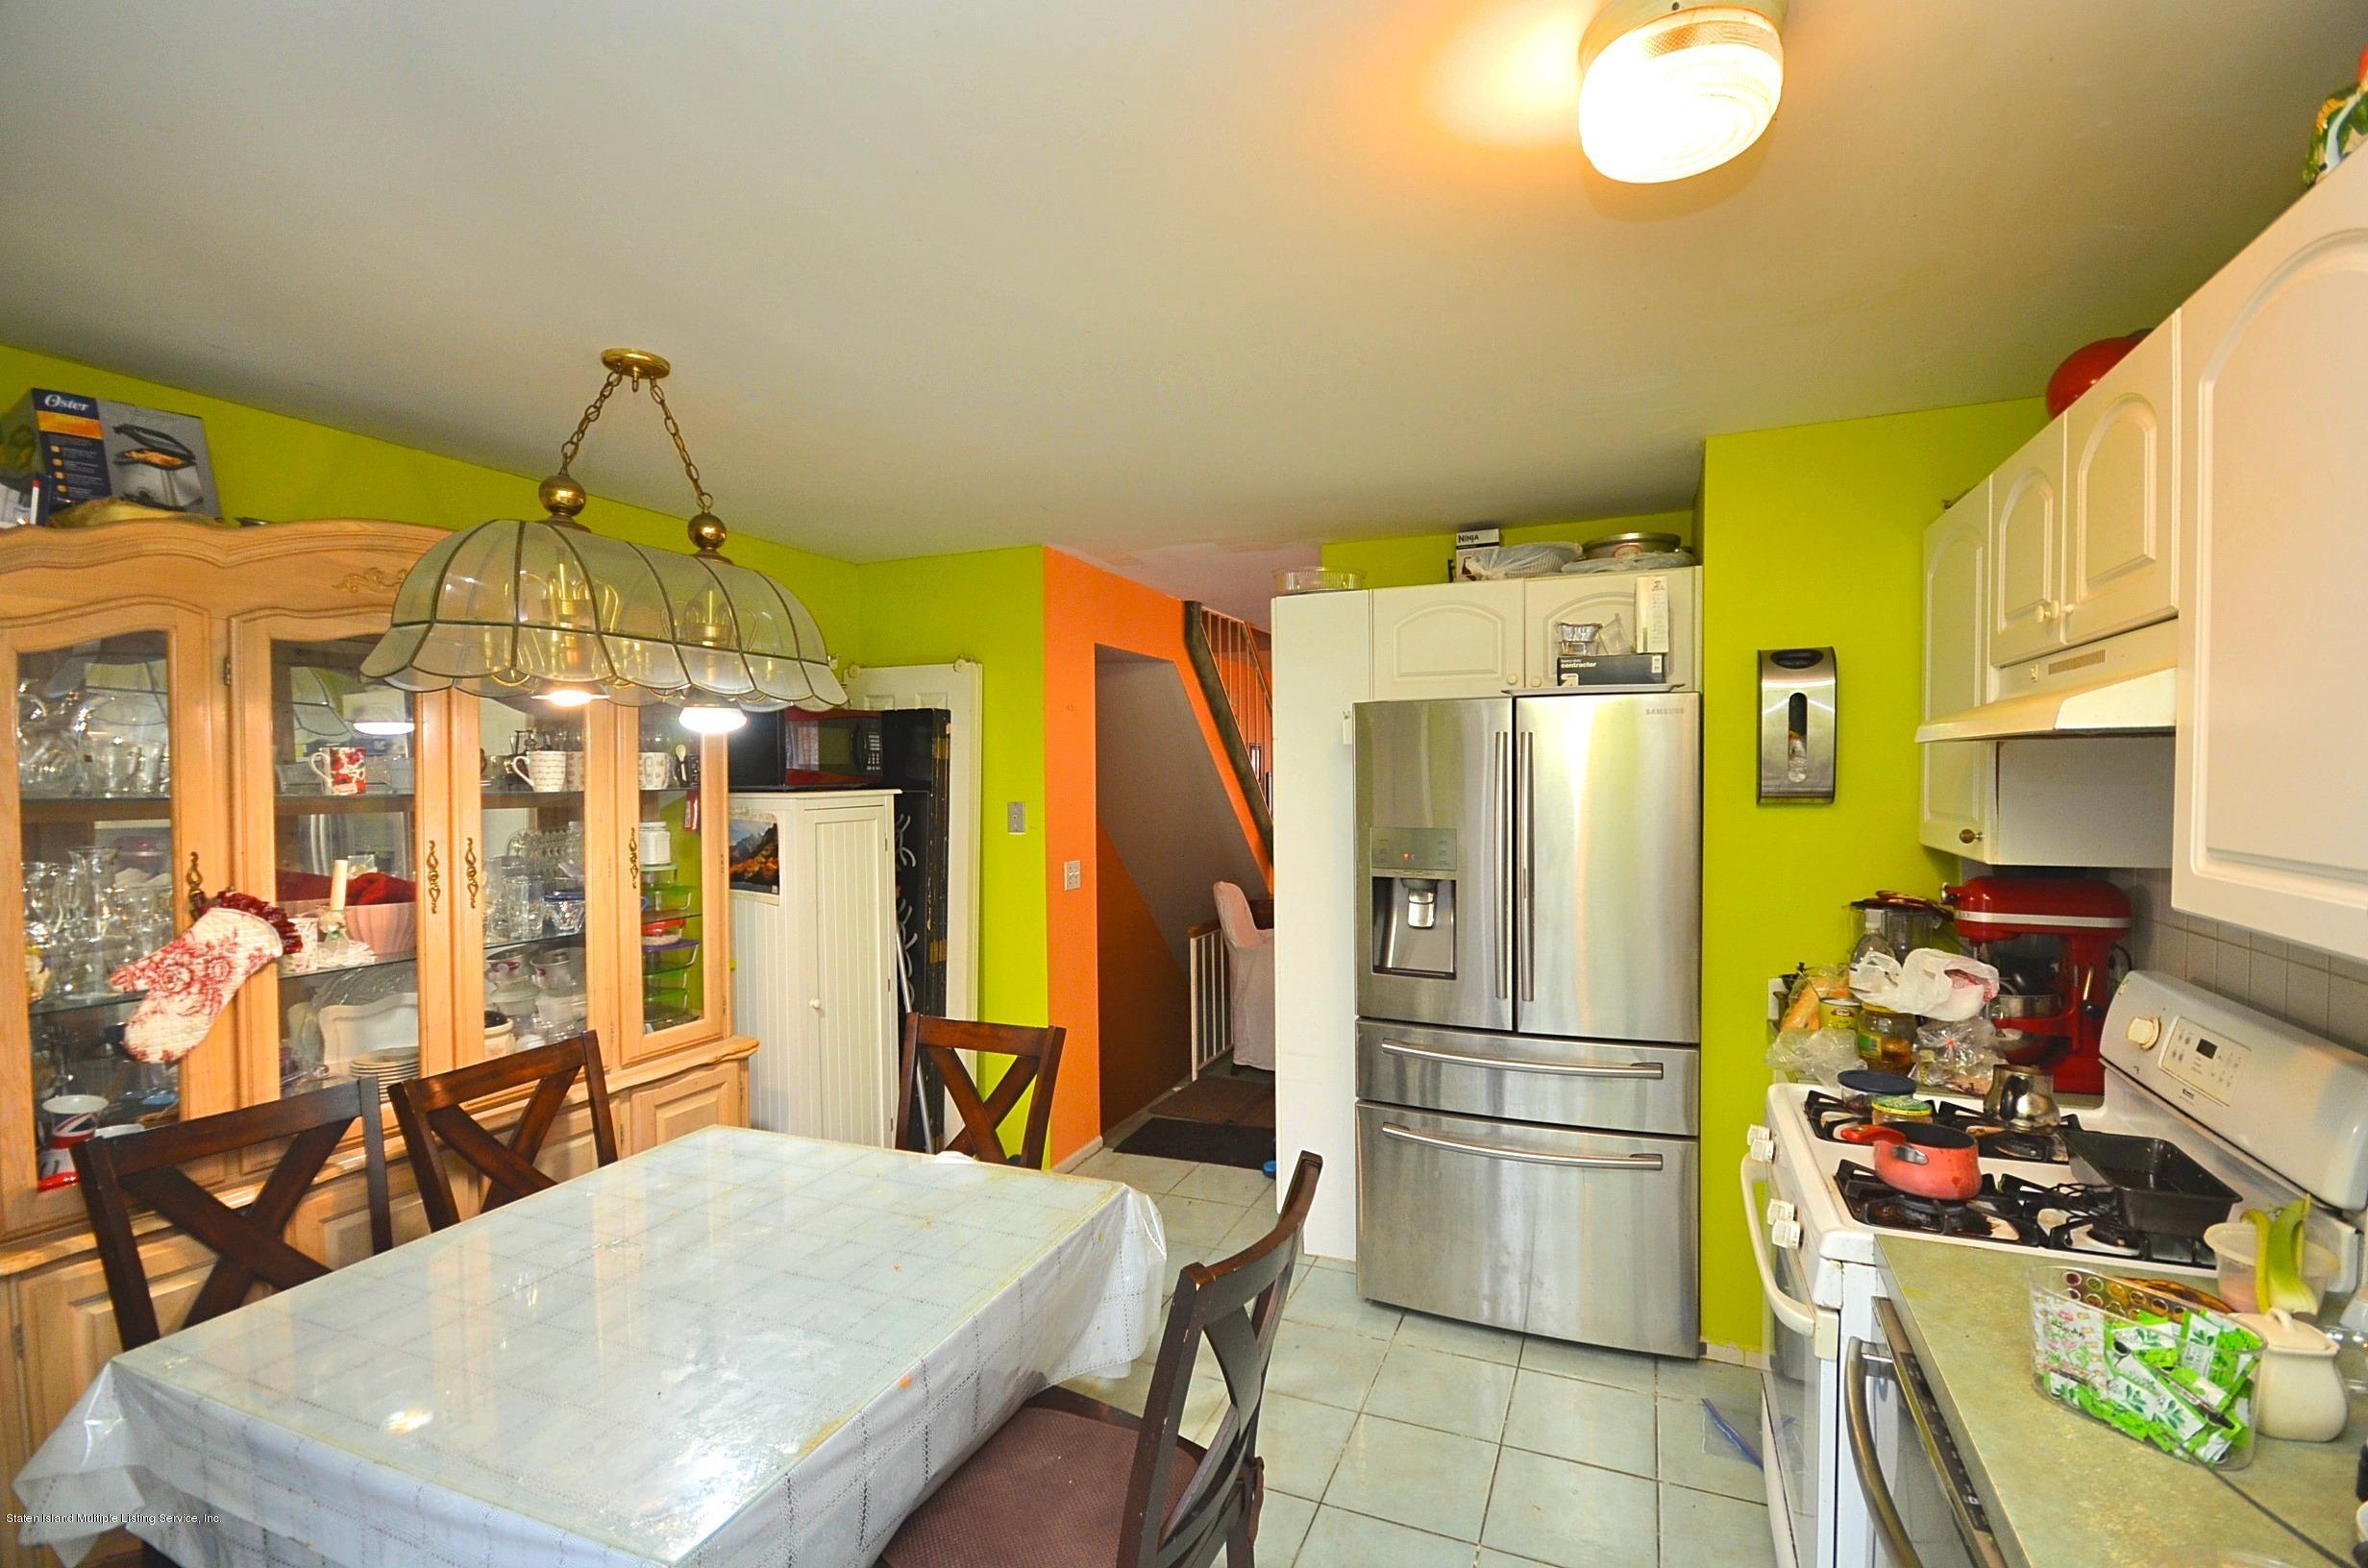 Single Family - Attached 200 Kenilworth Avenue  Staten Island, NY 10312, MLS-1124636-6